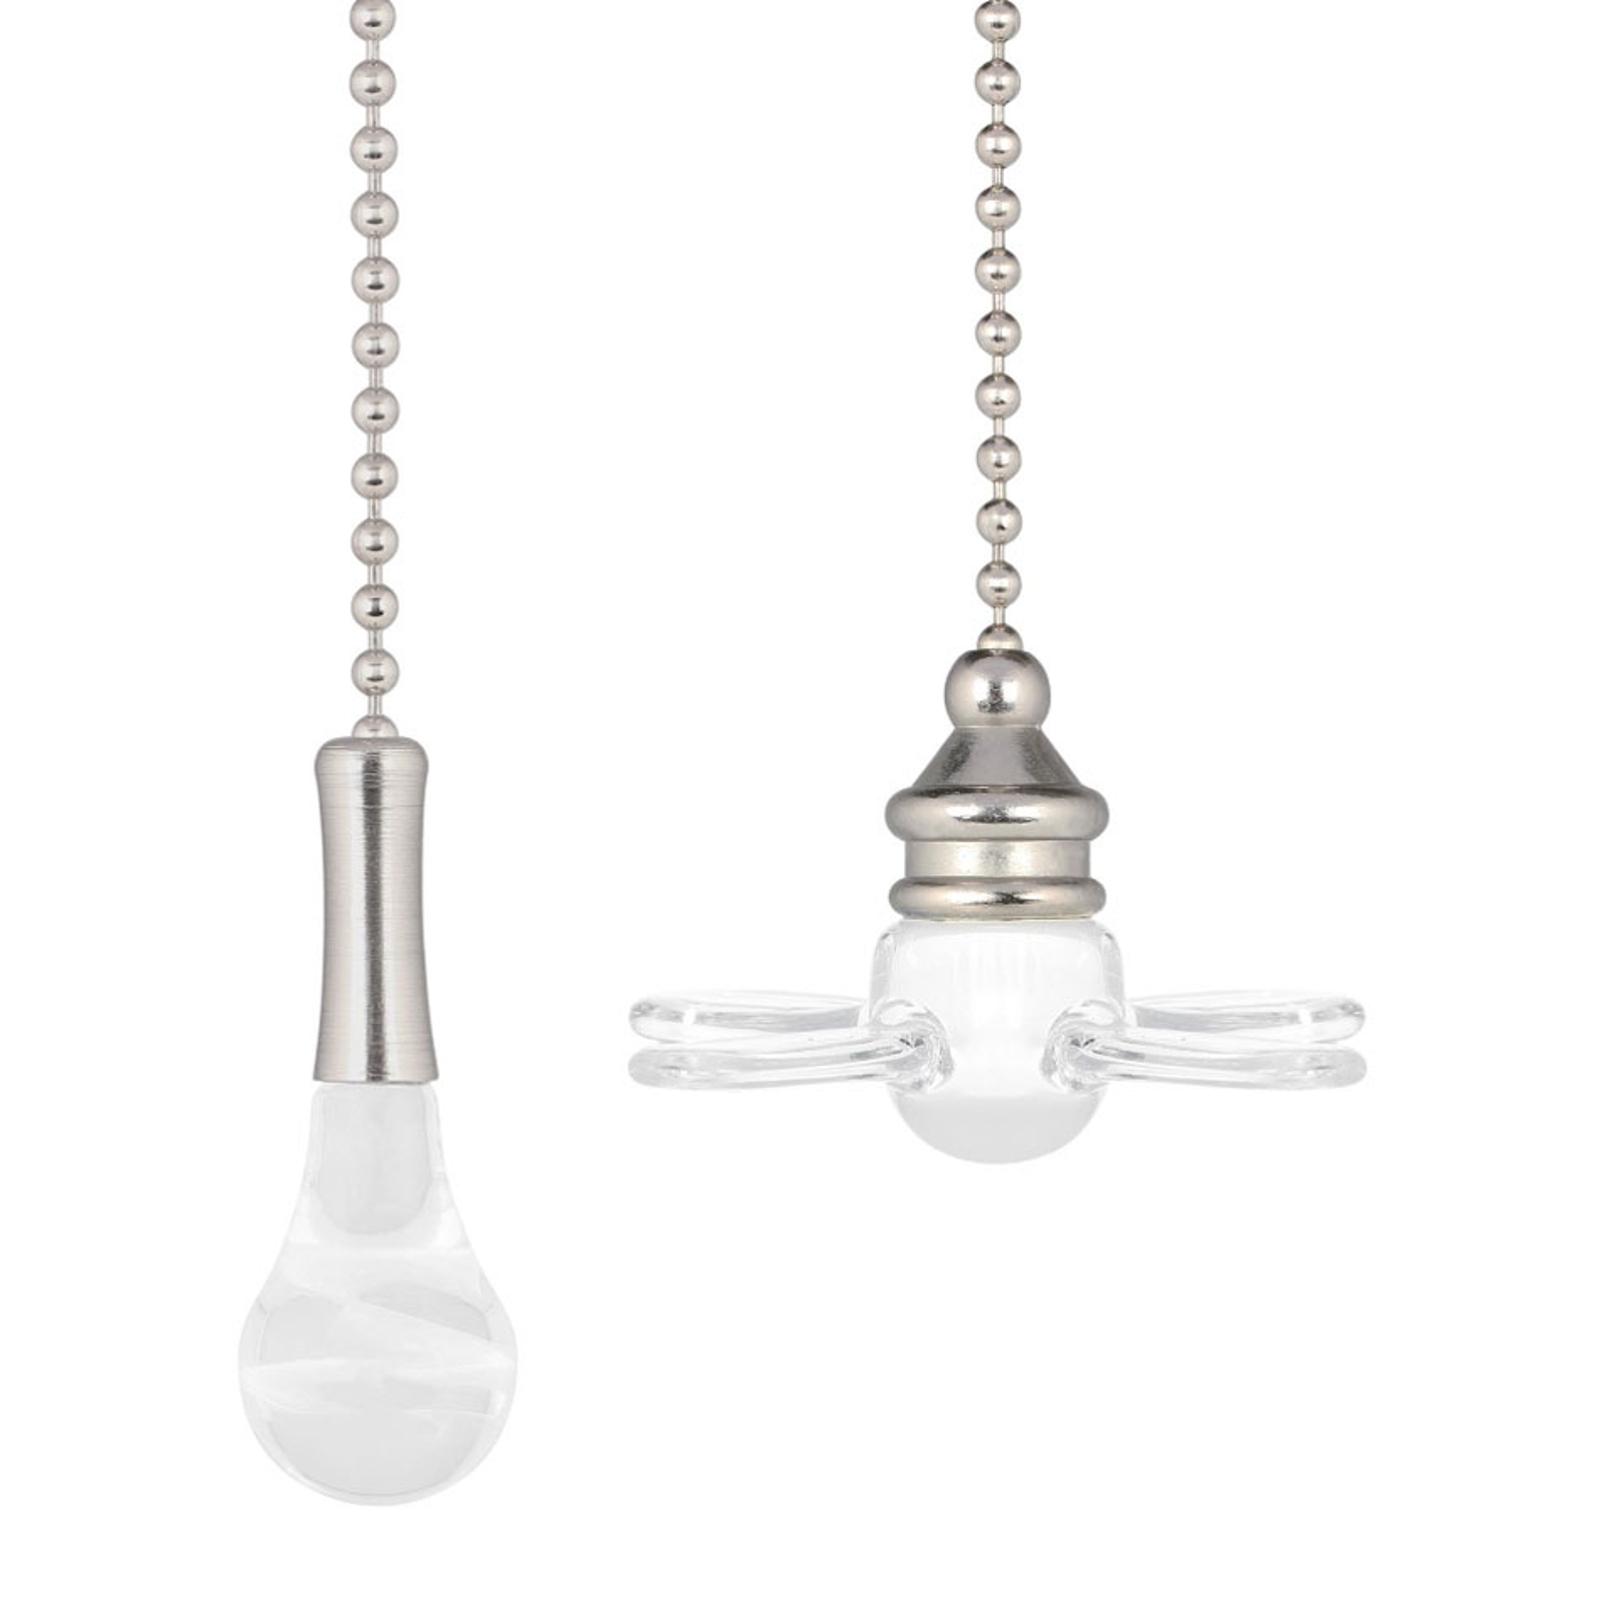 Westinghouse trækkædesæt til loftventilatorer